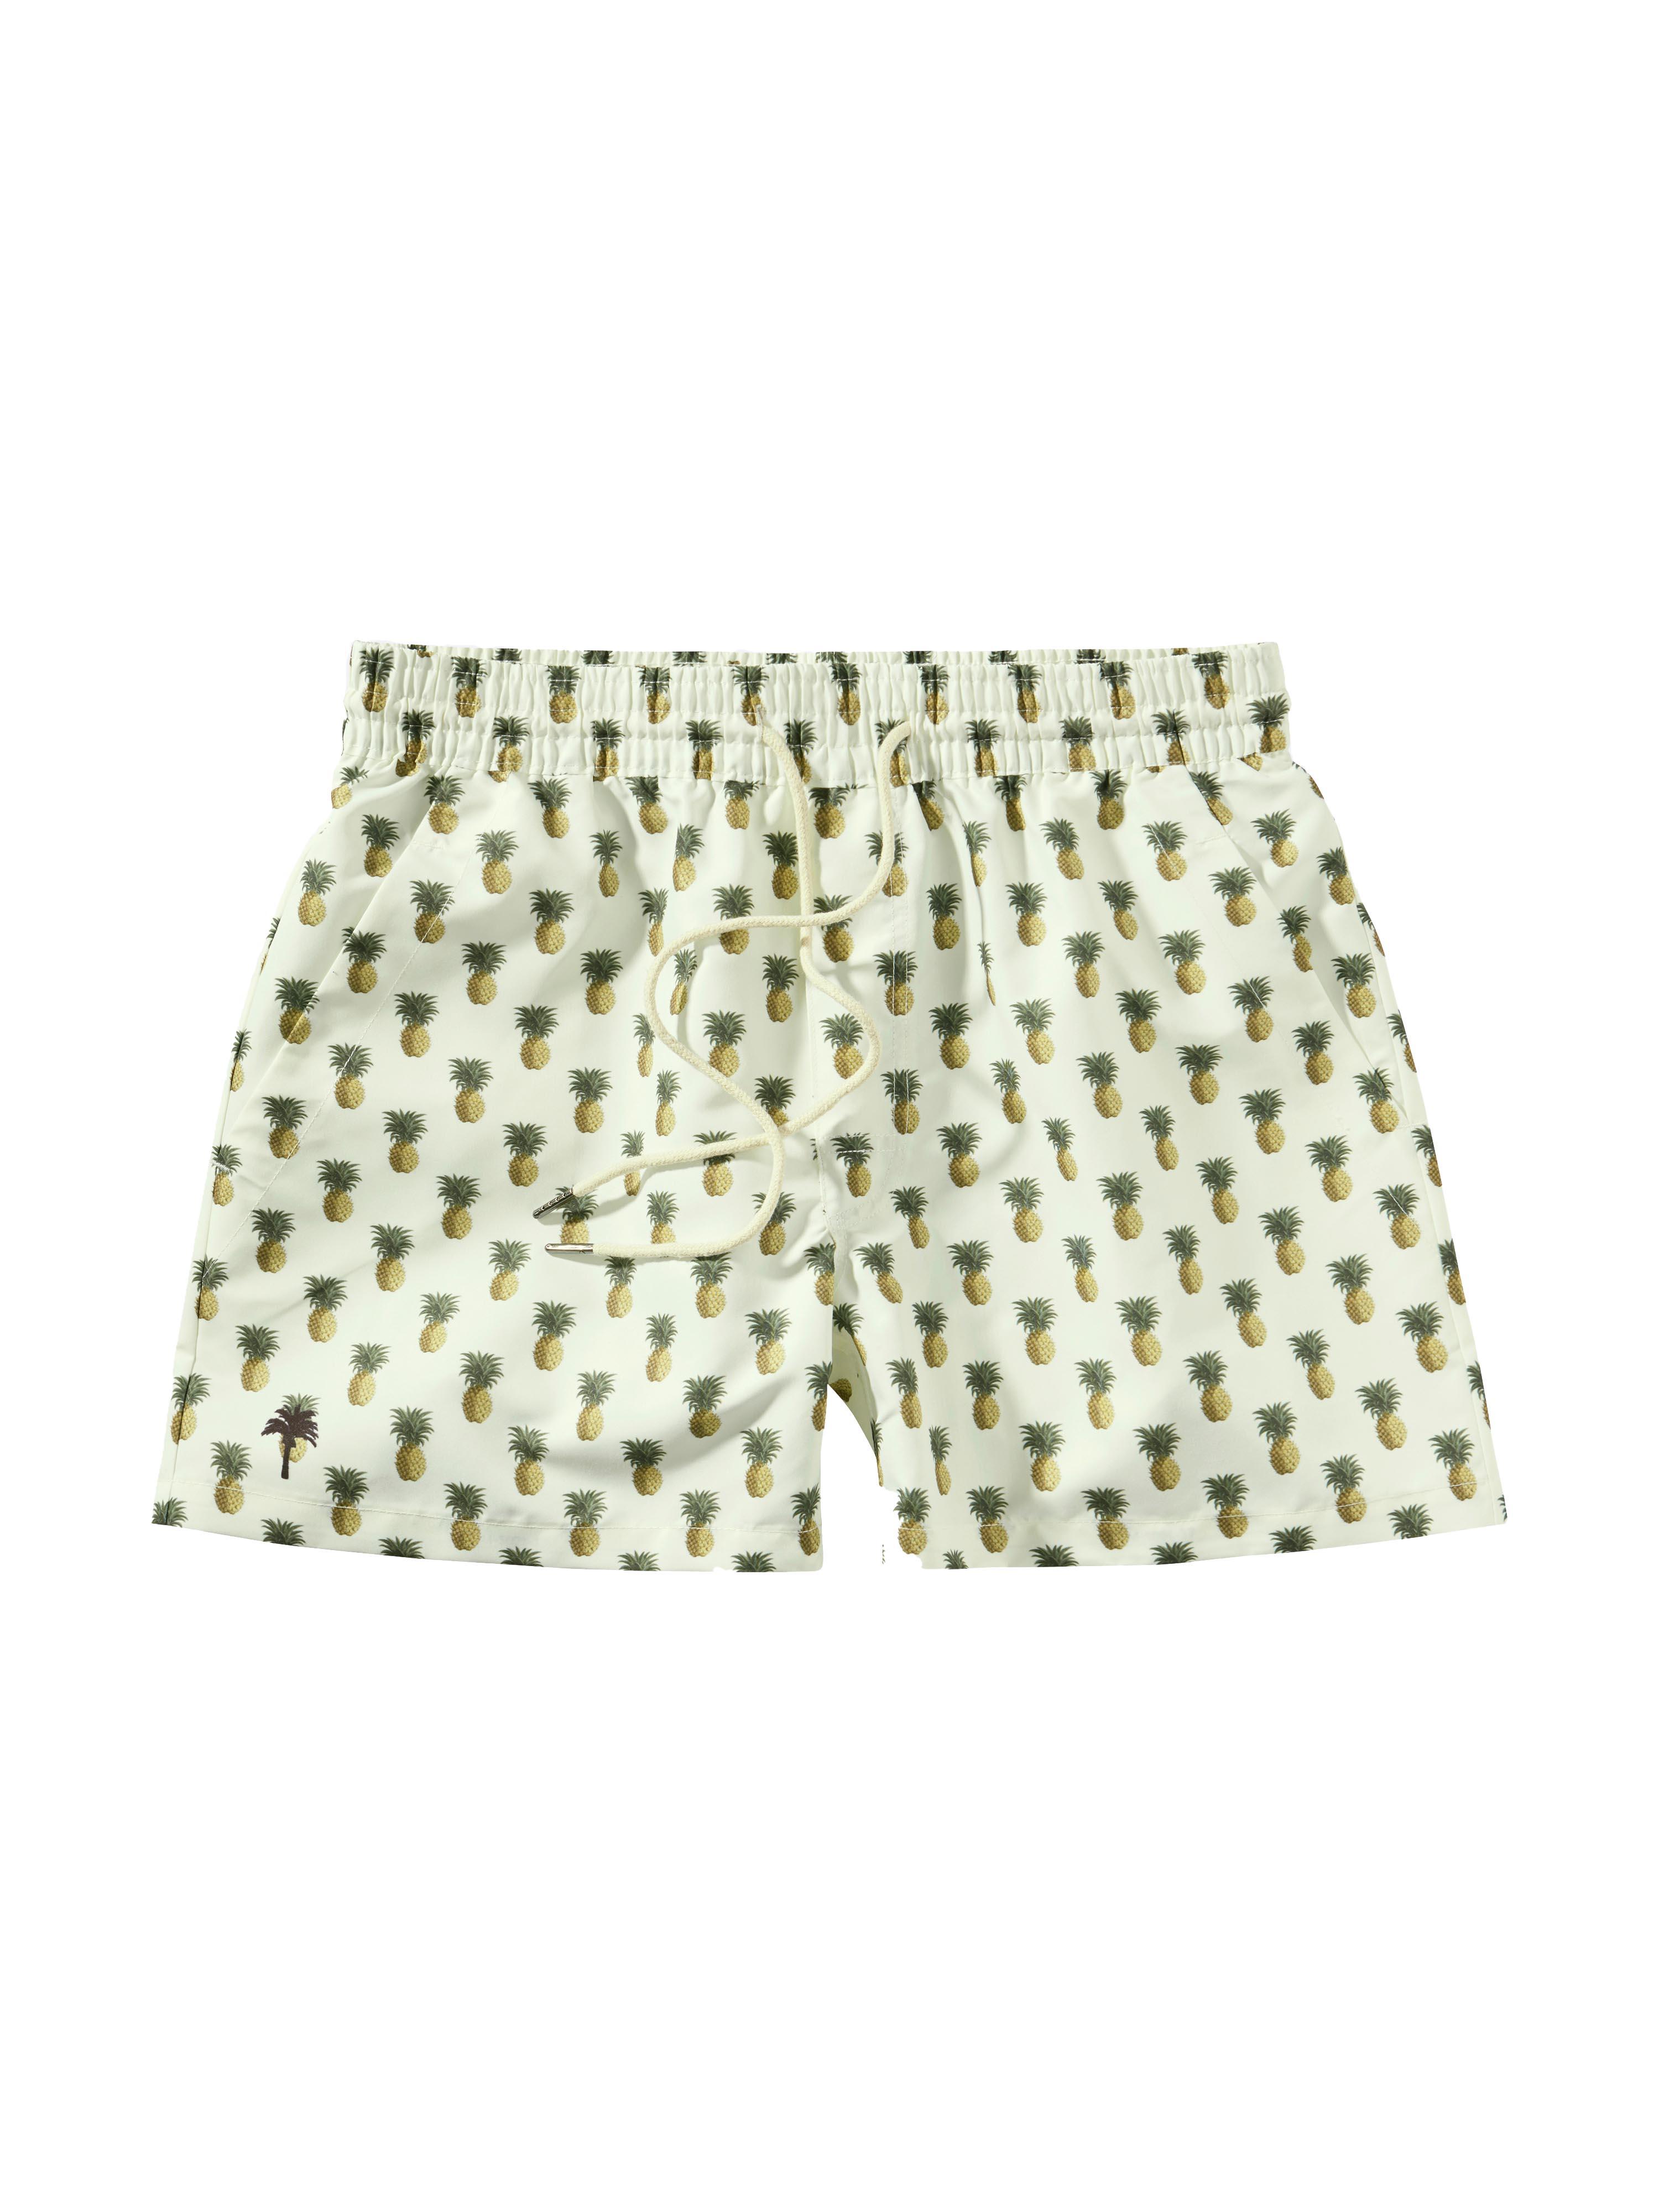 Pina Colada Swim Shorts